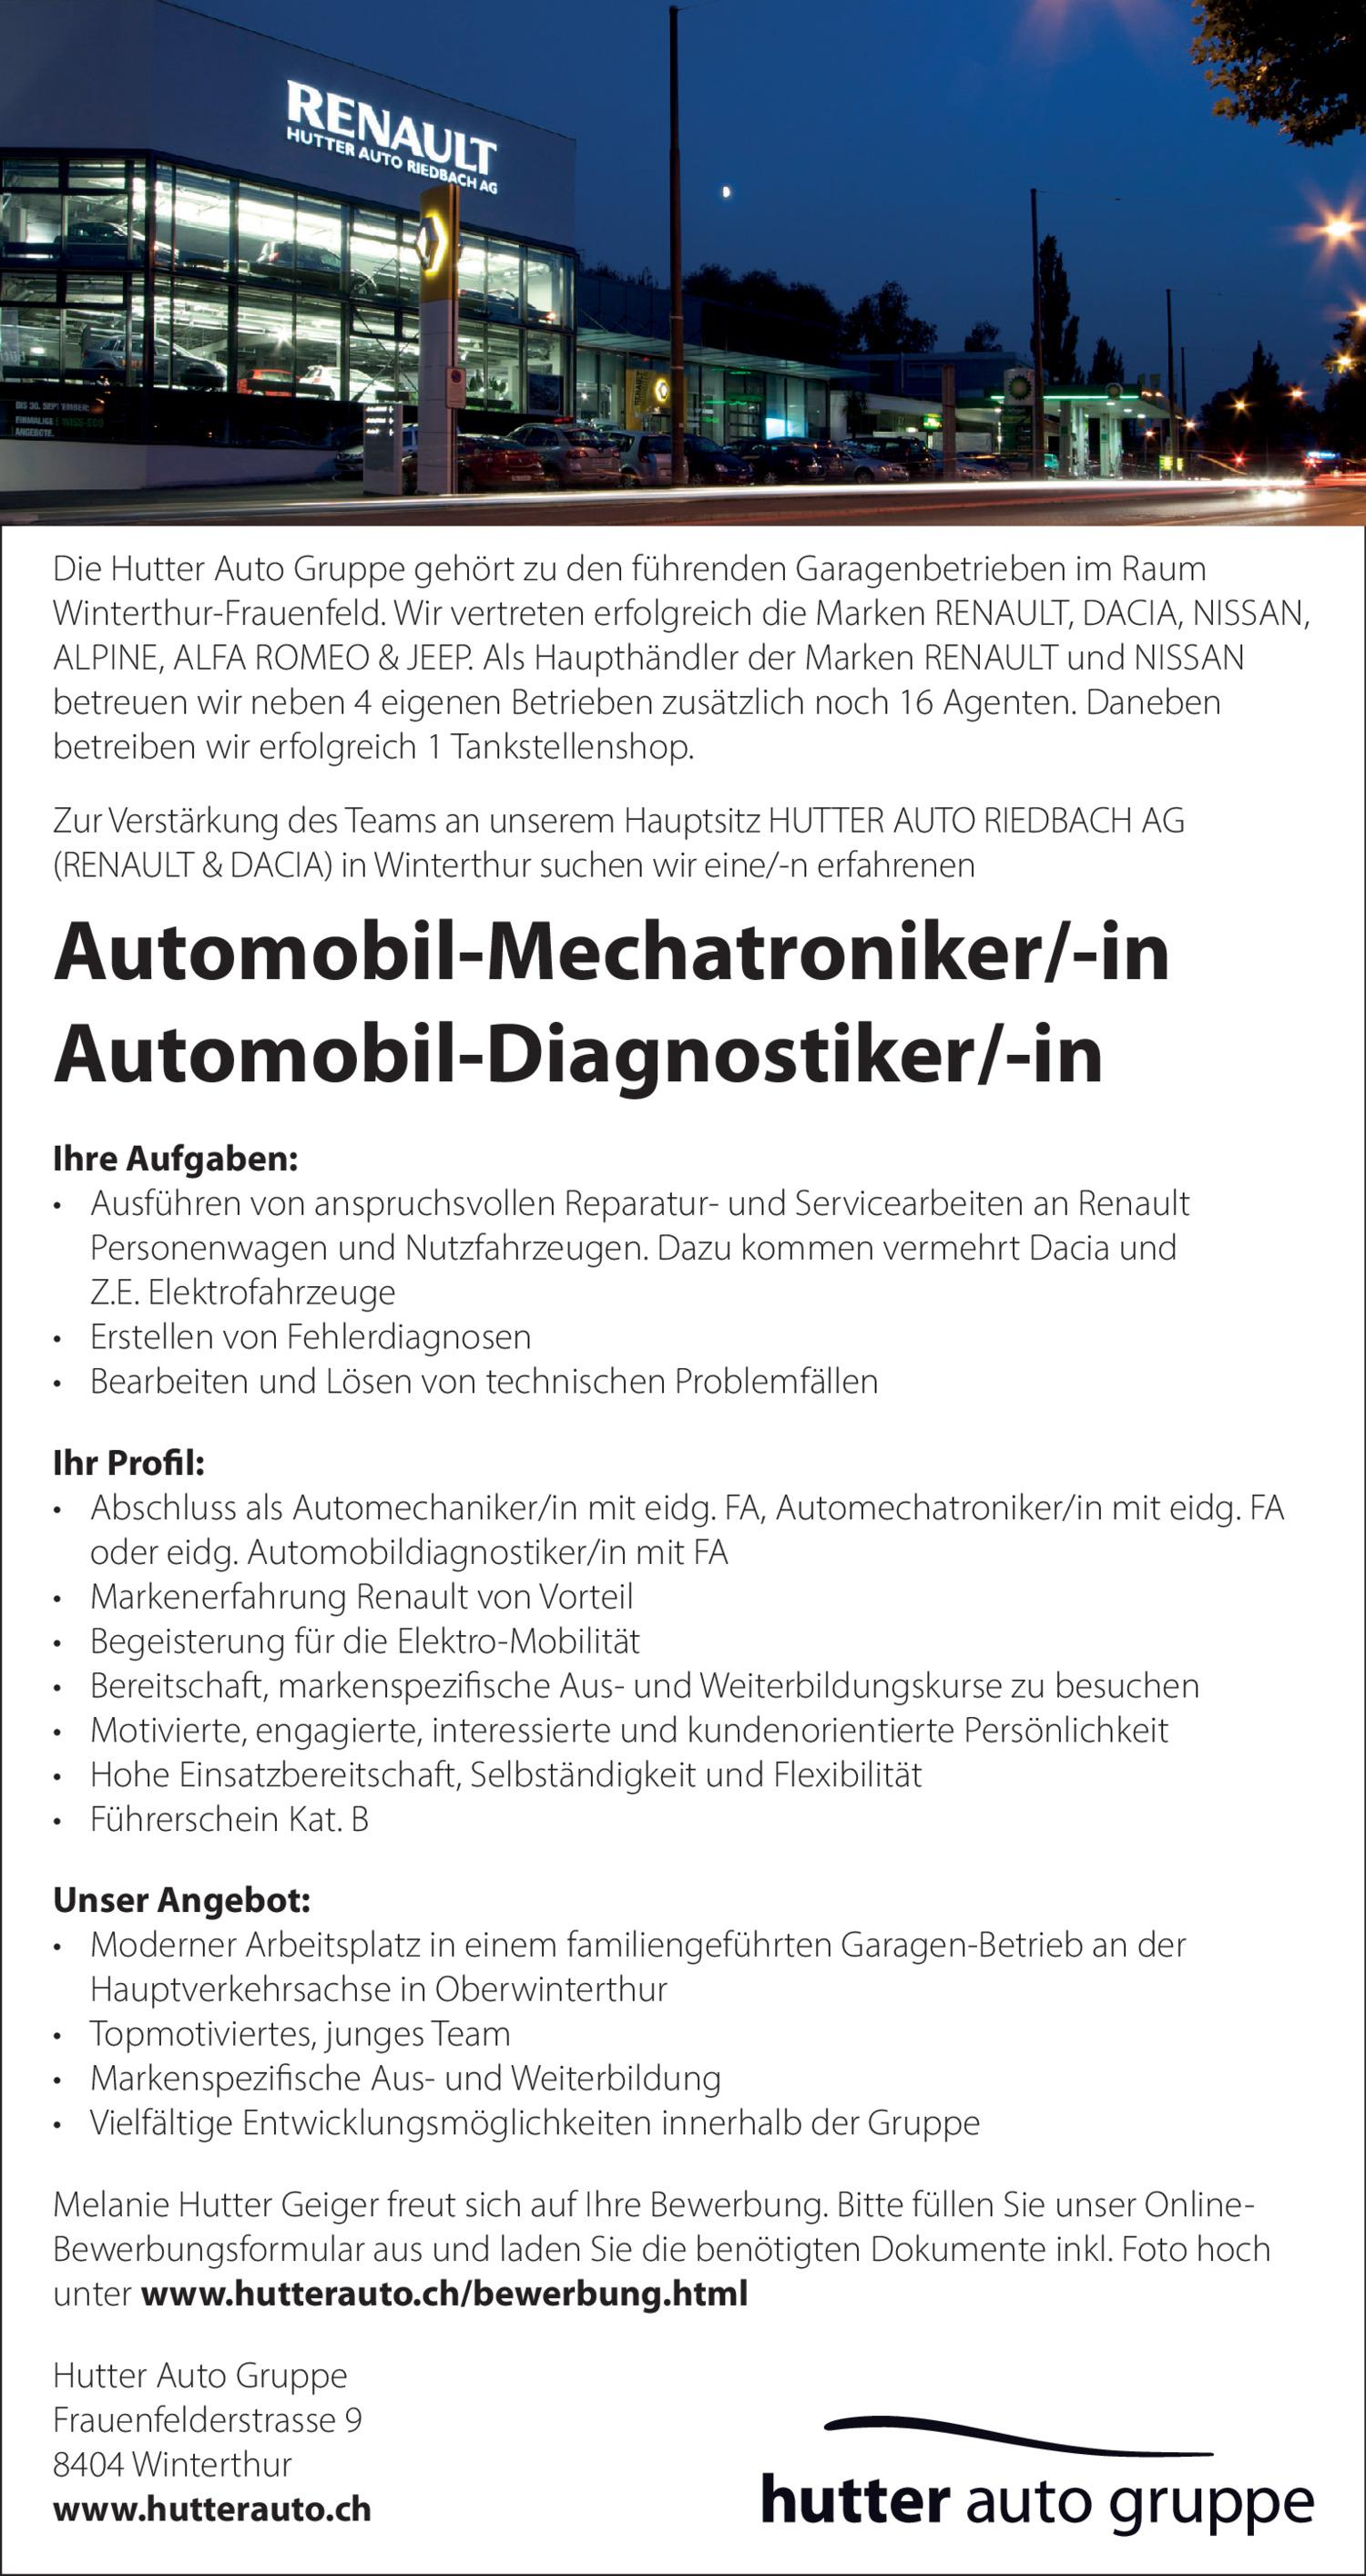 Inserat Automobil-Mechatroniker/-in oder Automobil-Diagnostiker/-in